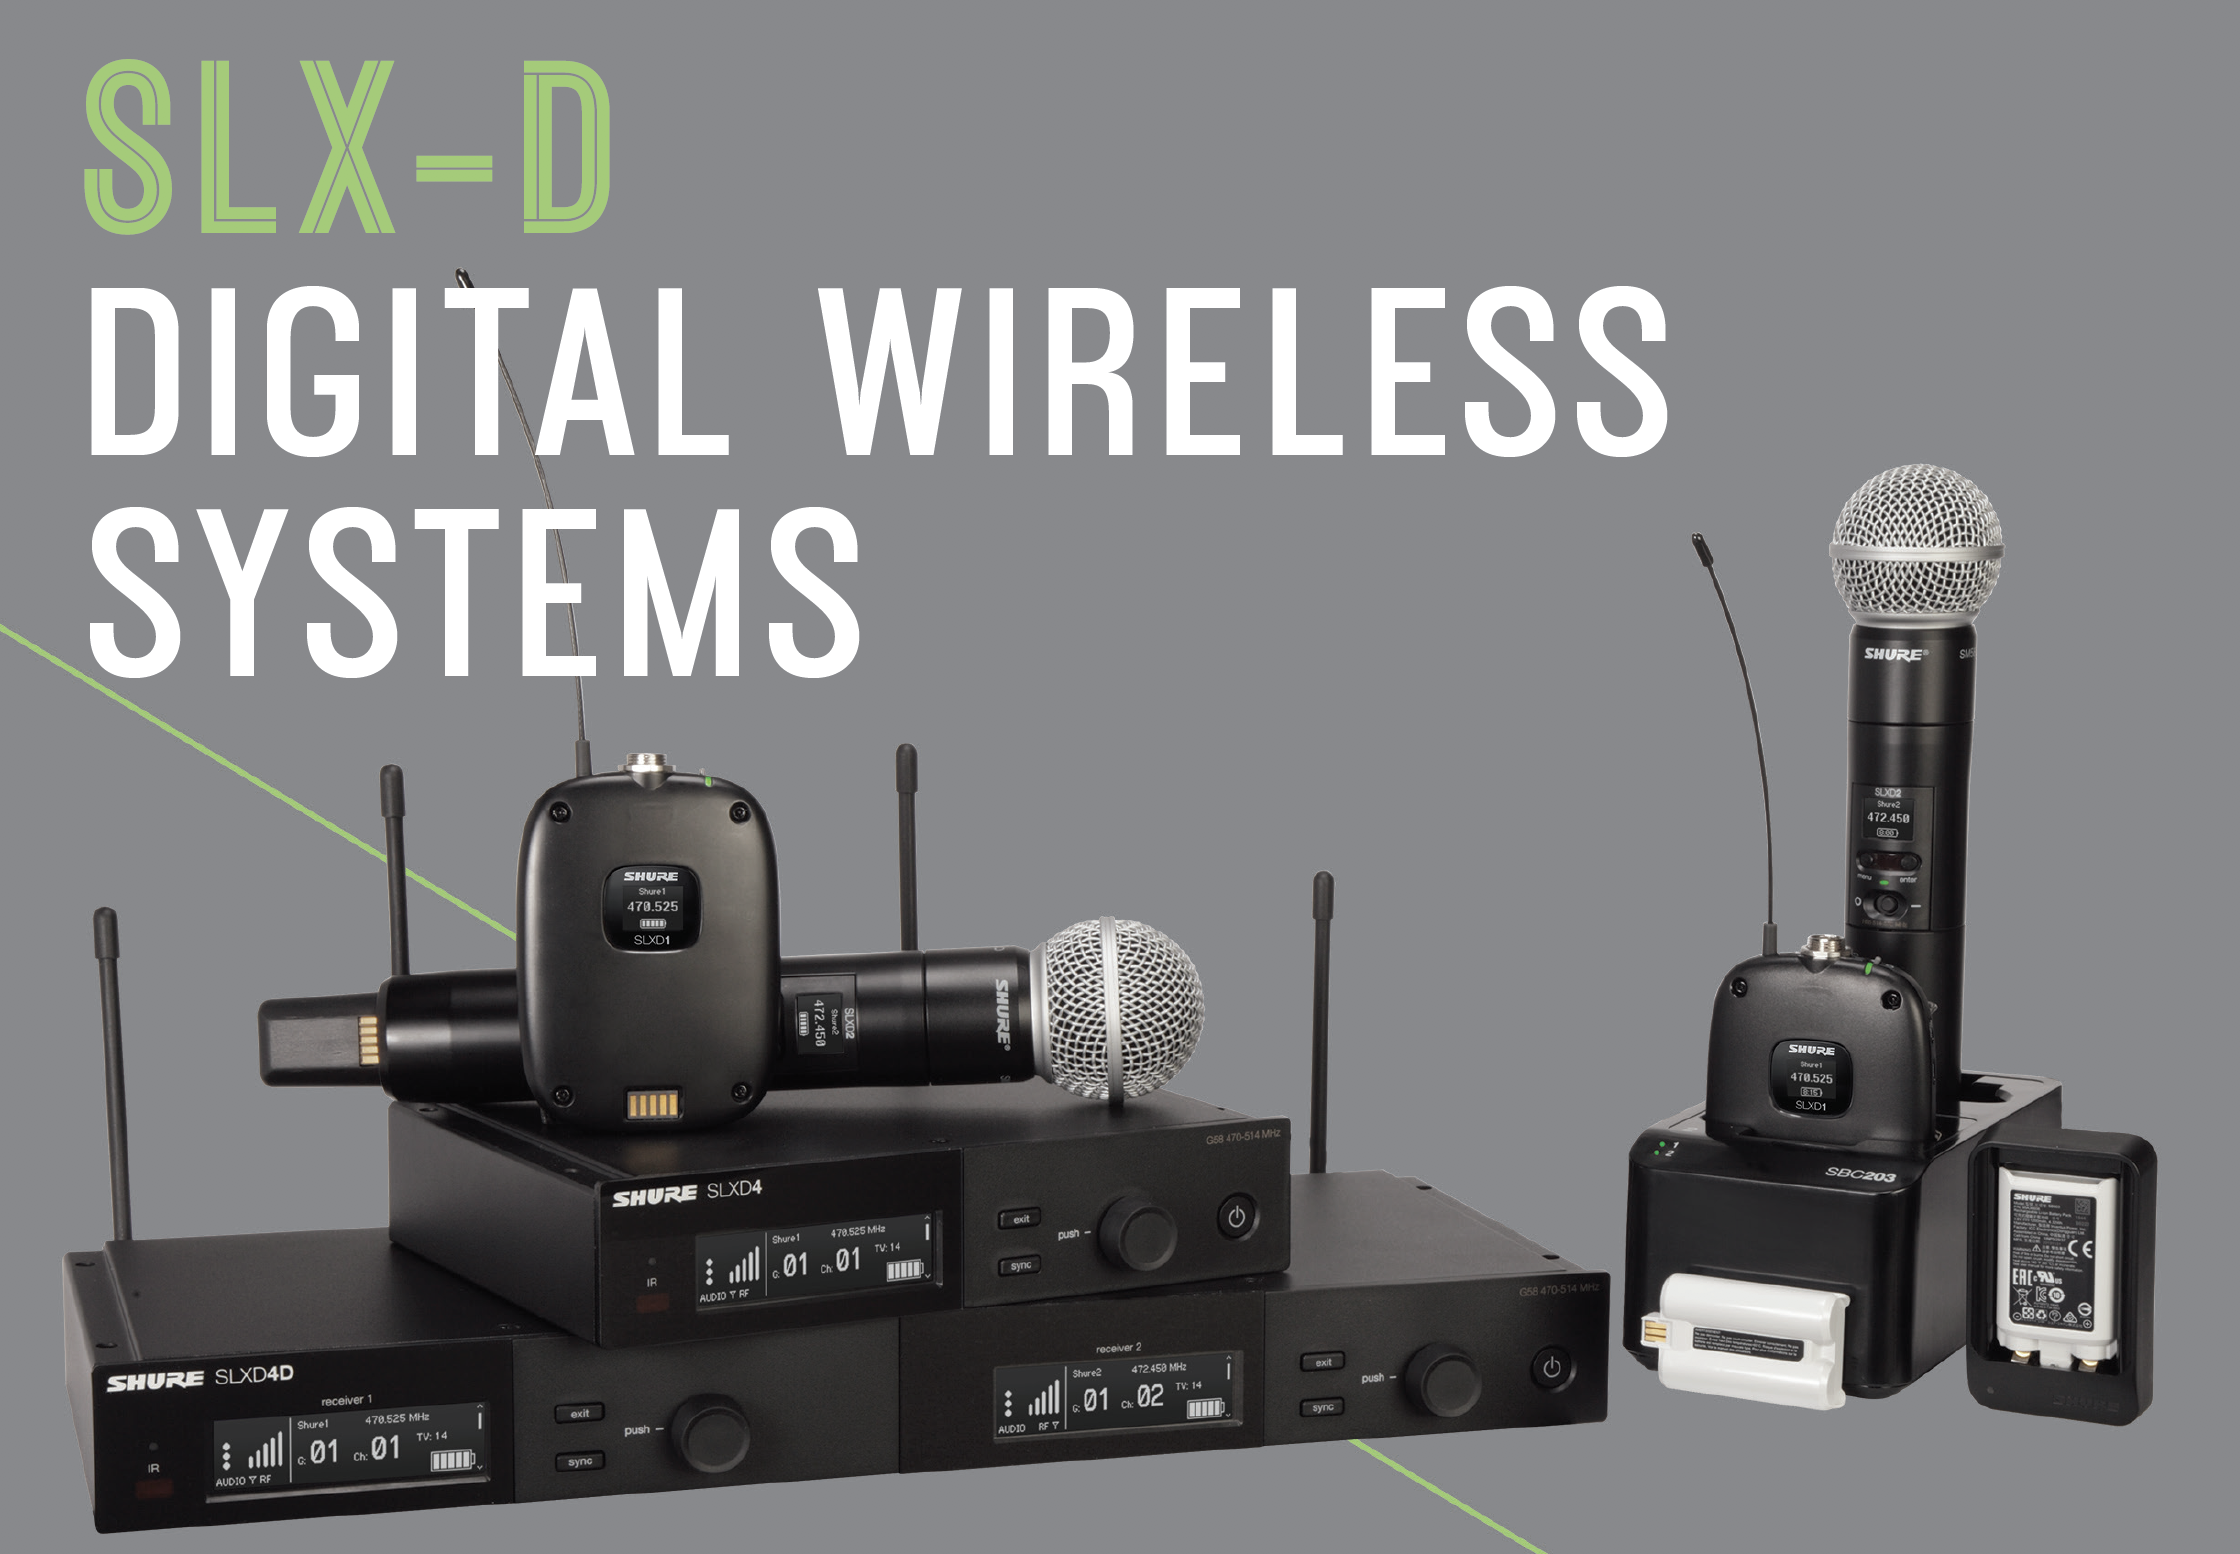 Shure SLXD family of wireless